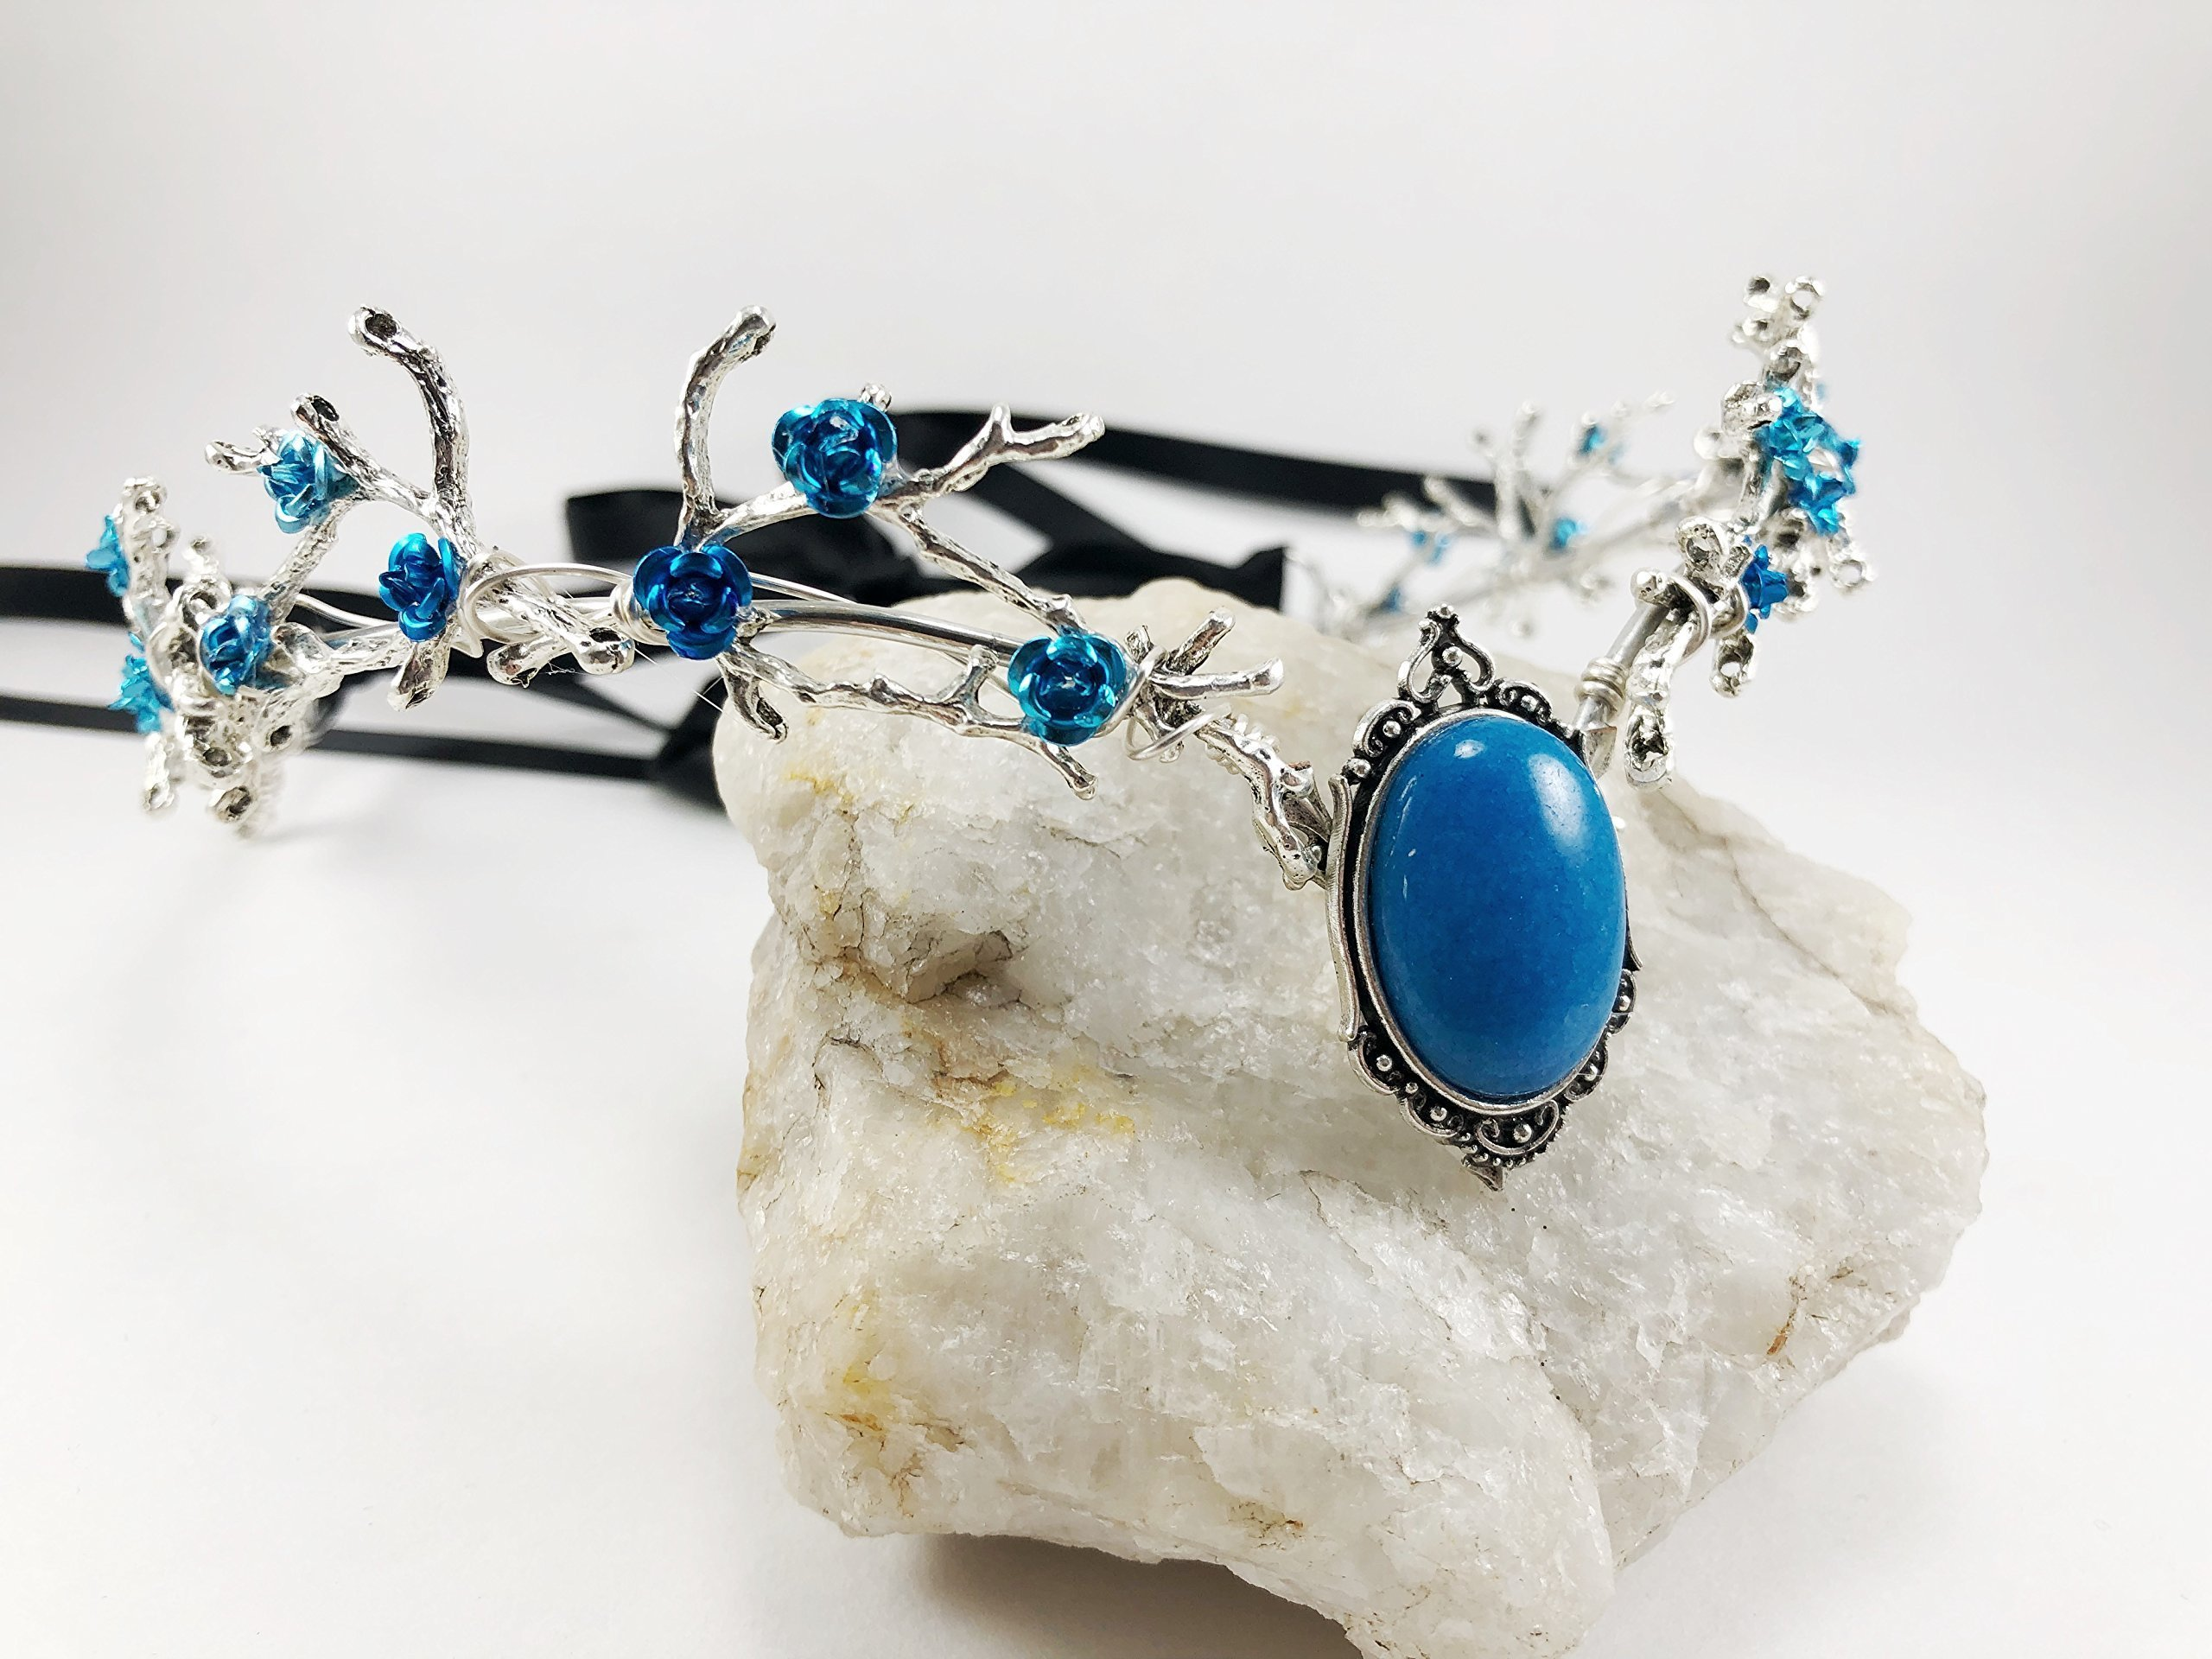 Silver Circlet Wedding Tiara with Silver Twigs, Queen Crown, Fairy Princess Crown, Woodland Fairy Queen Crown